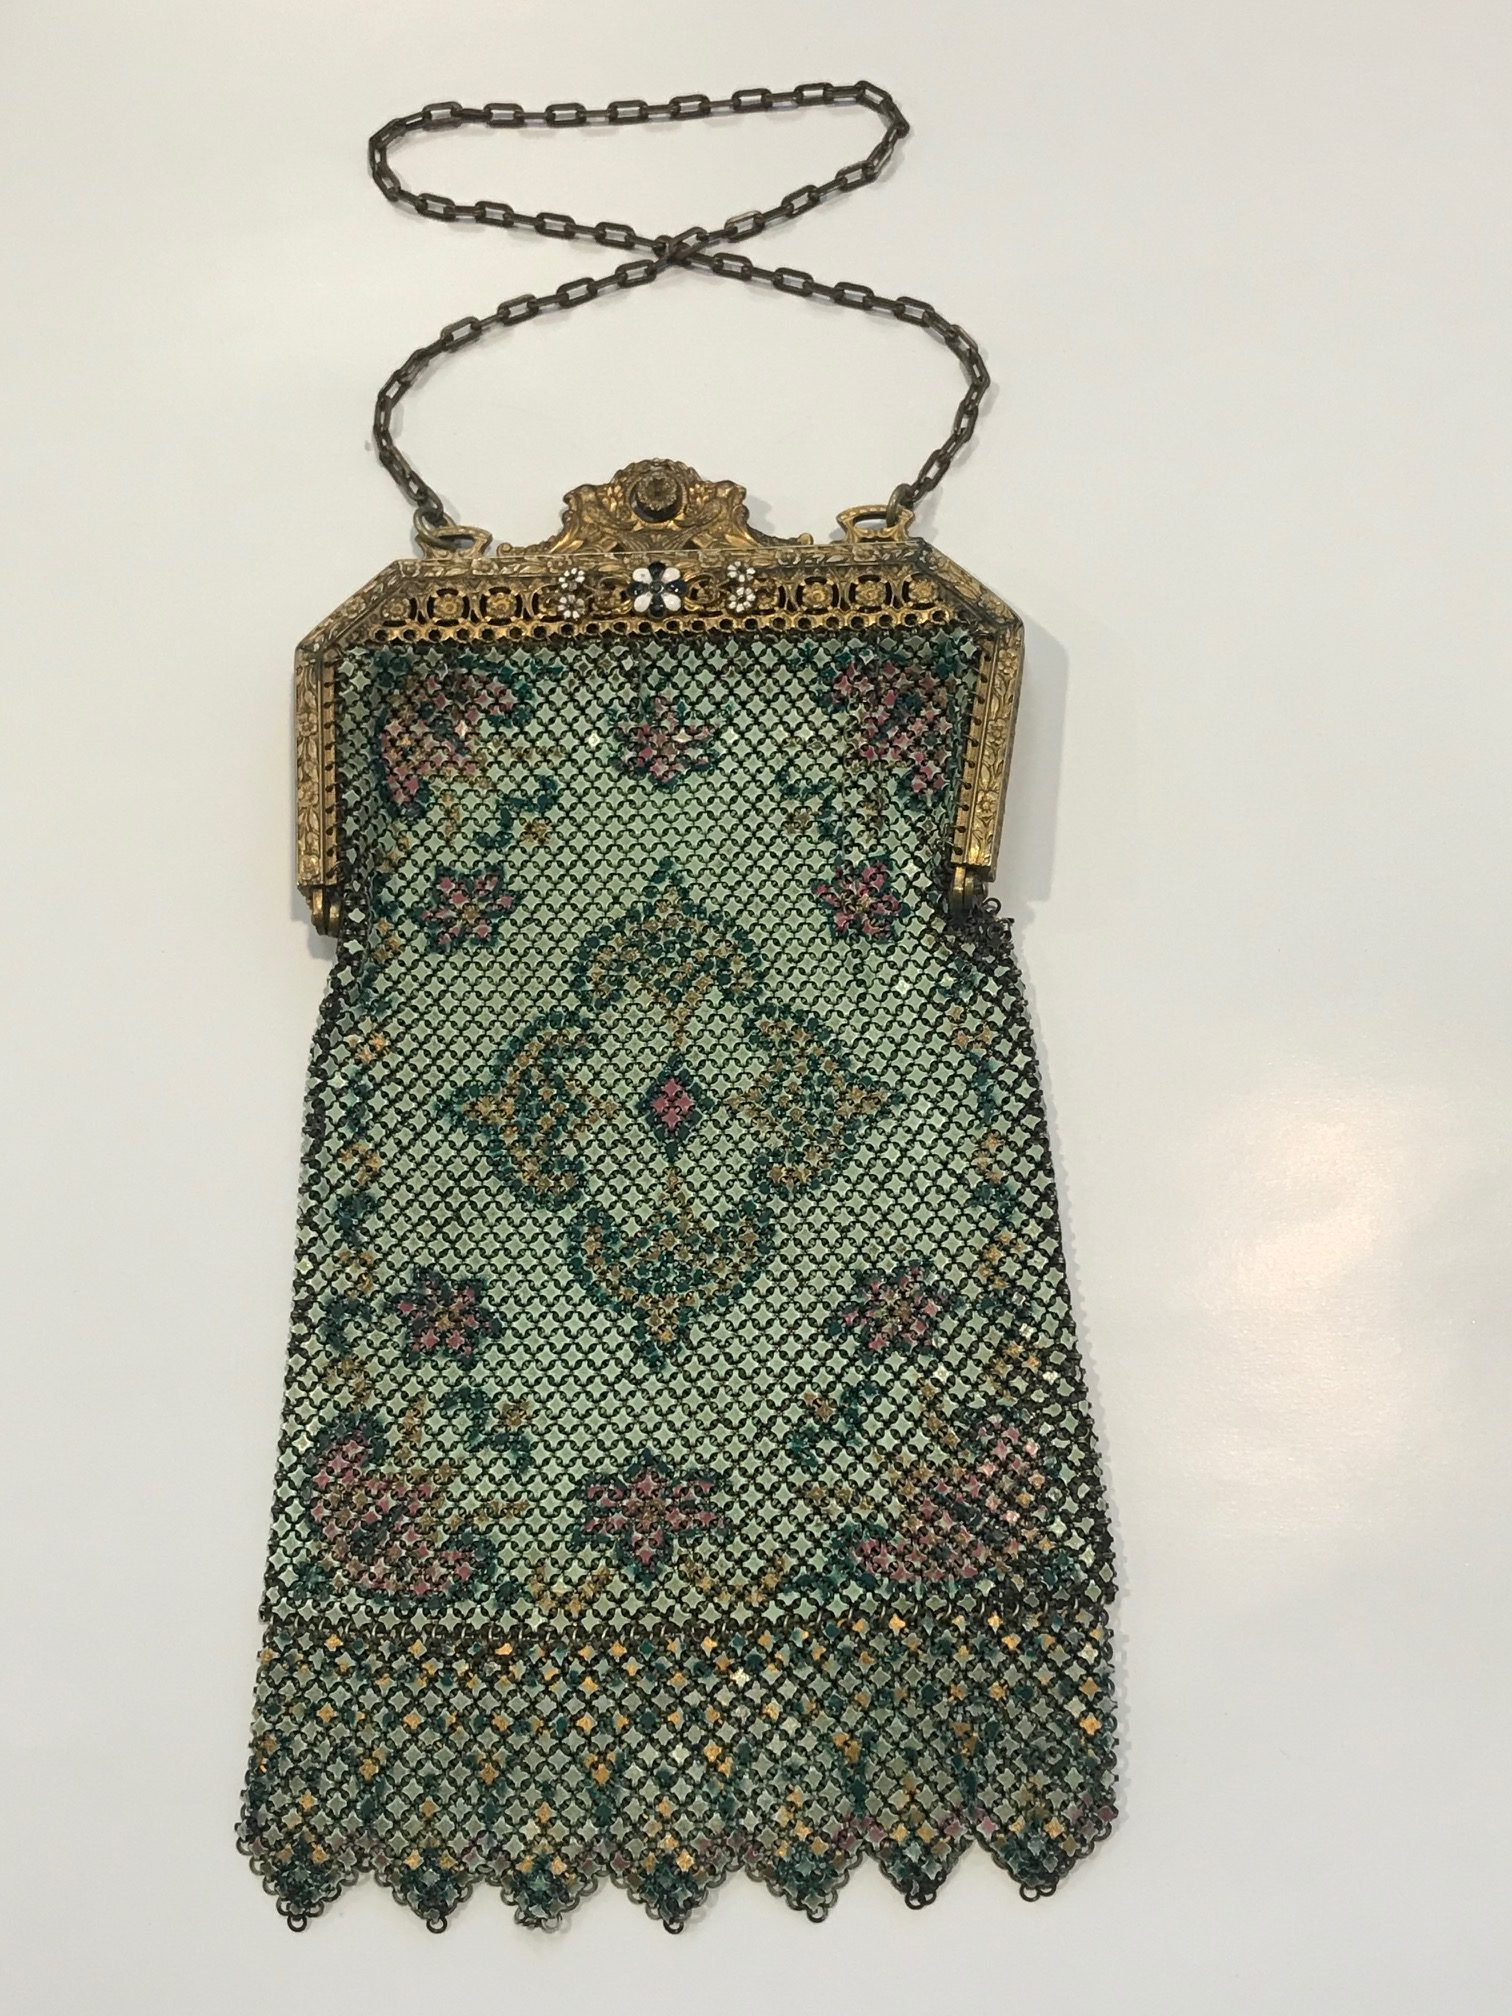 Antique Mandalian Enamel Mesh Purse